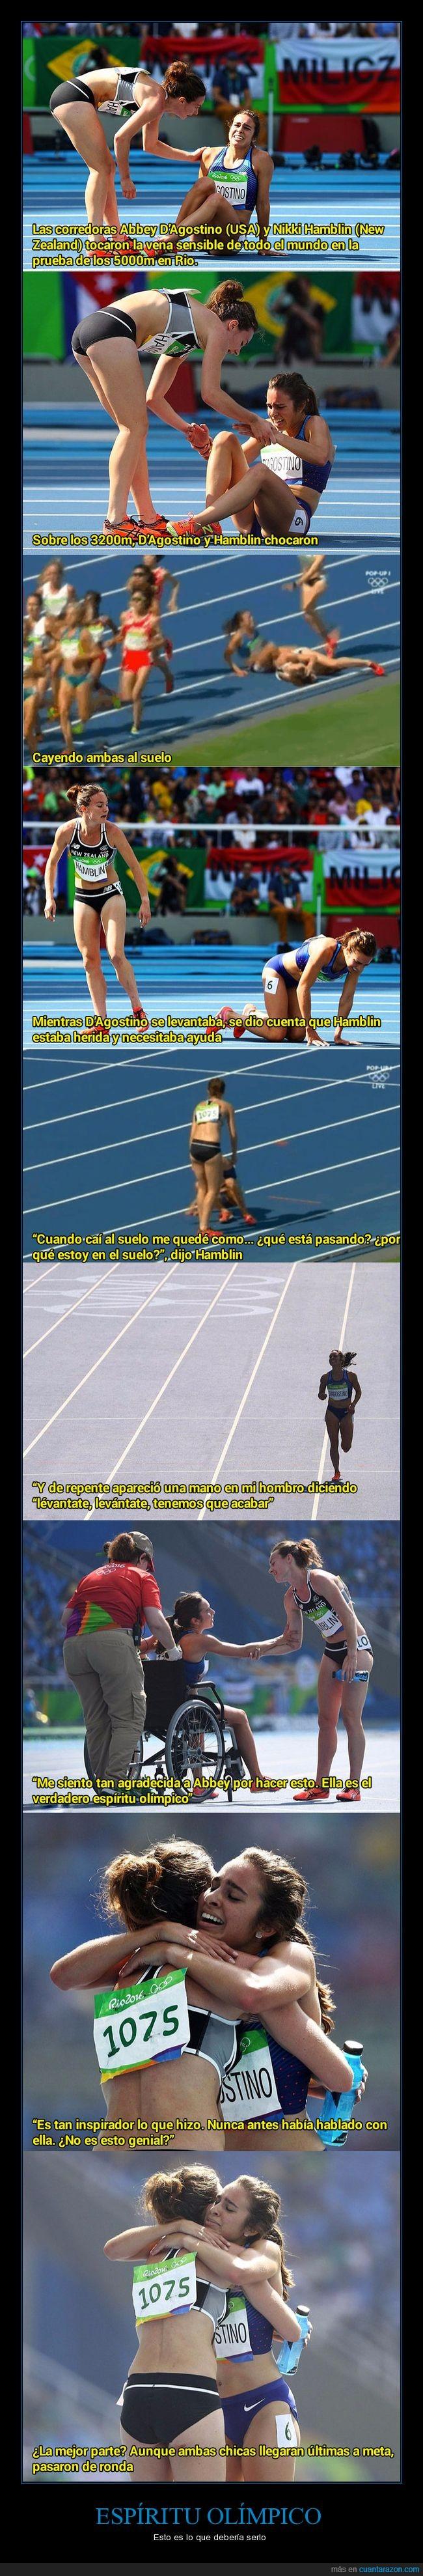 atletismo,espíritu olímpico,jjoo,juegos olímpicos